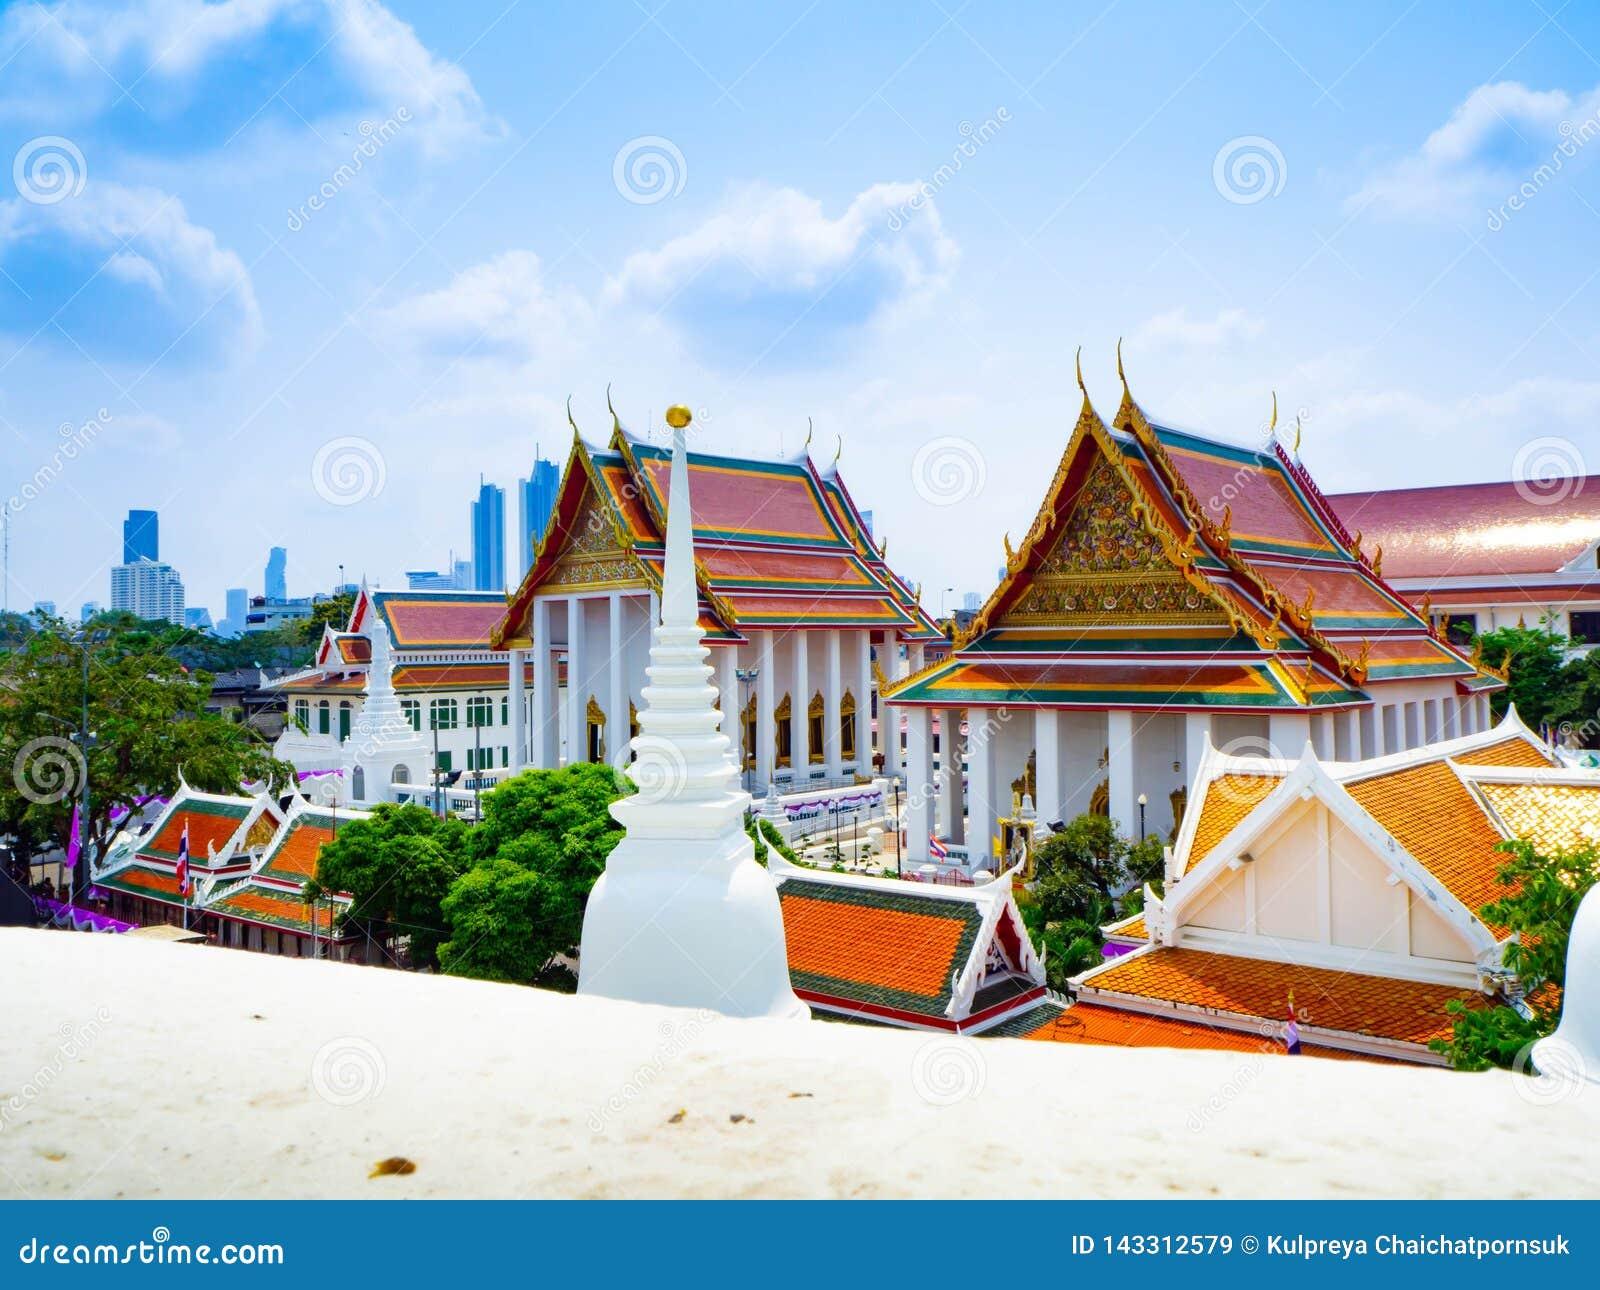 Prayun Temple white is beautiful